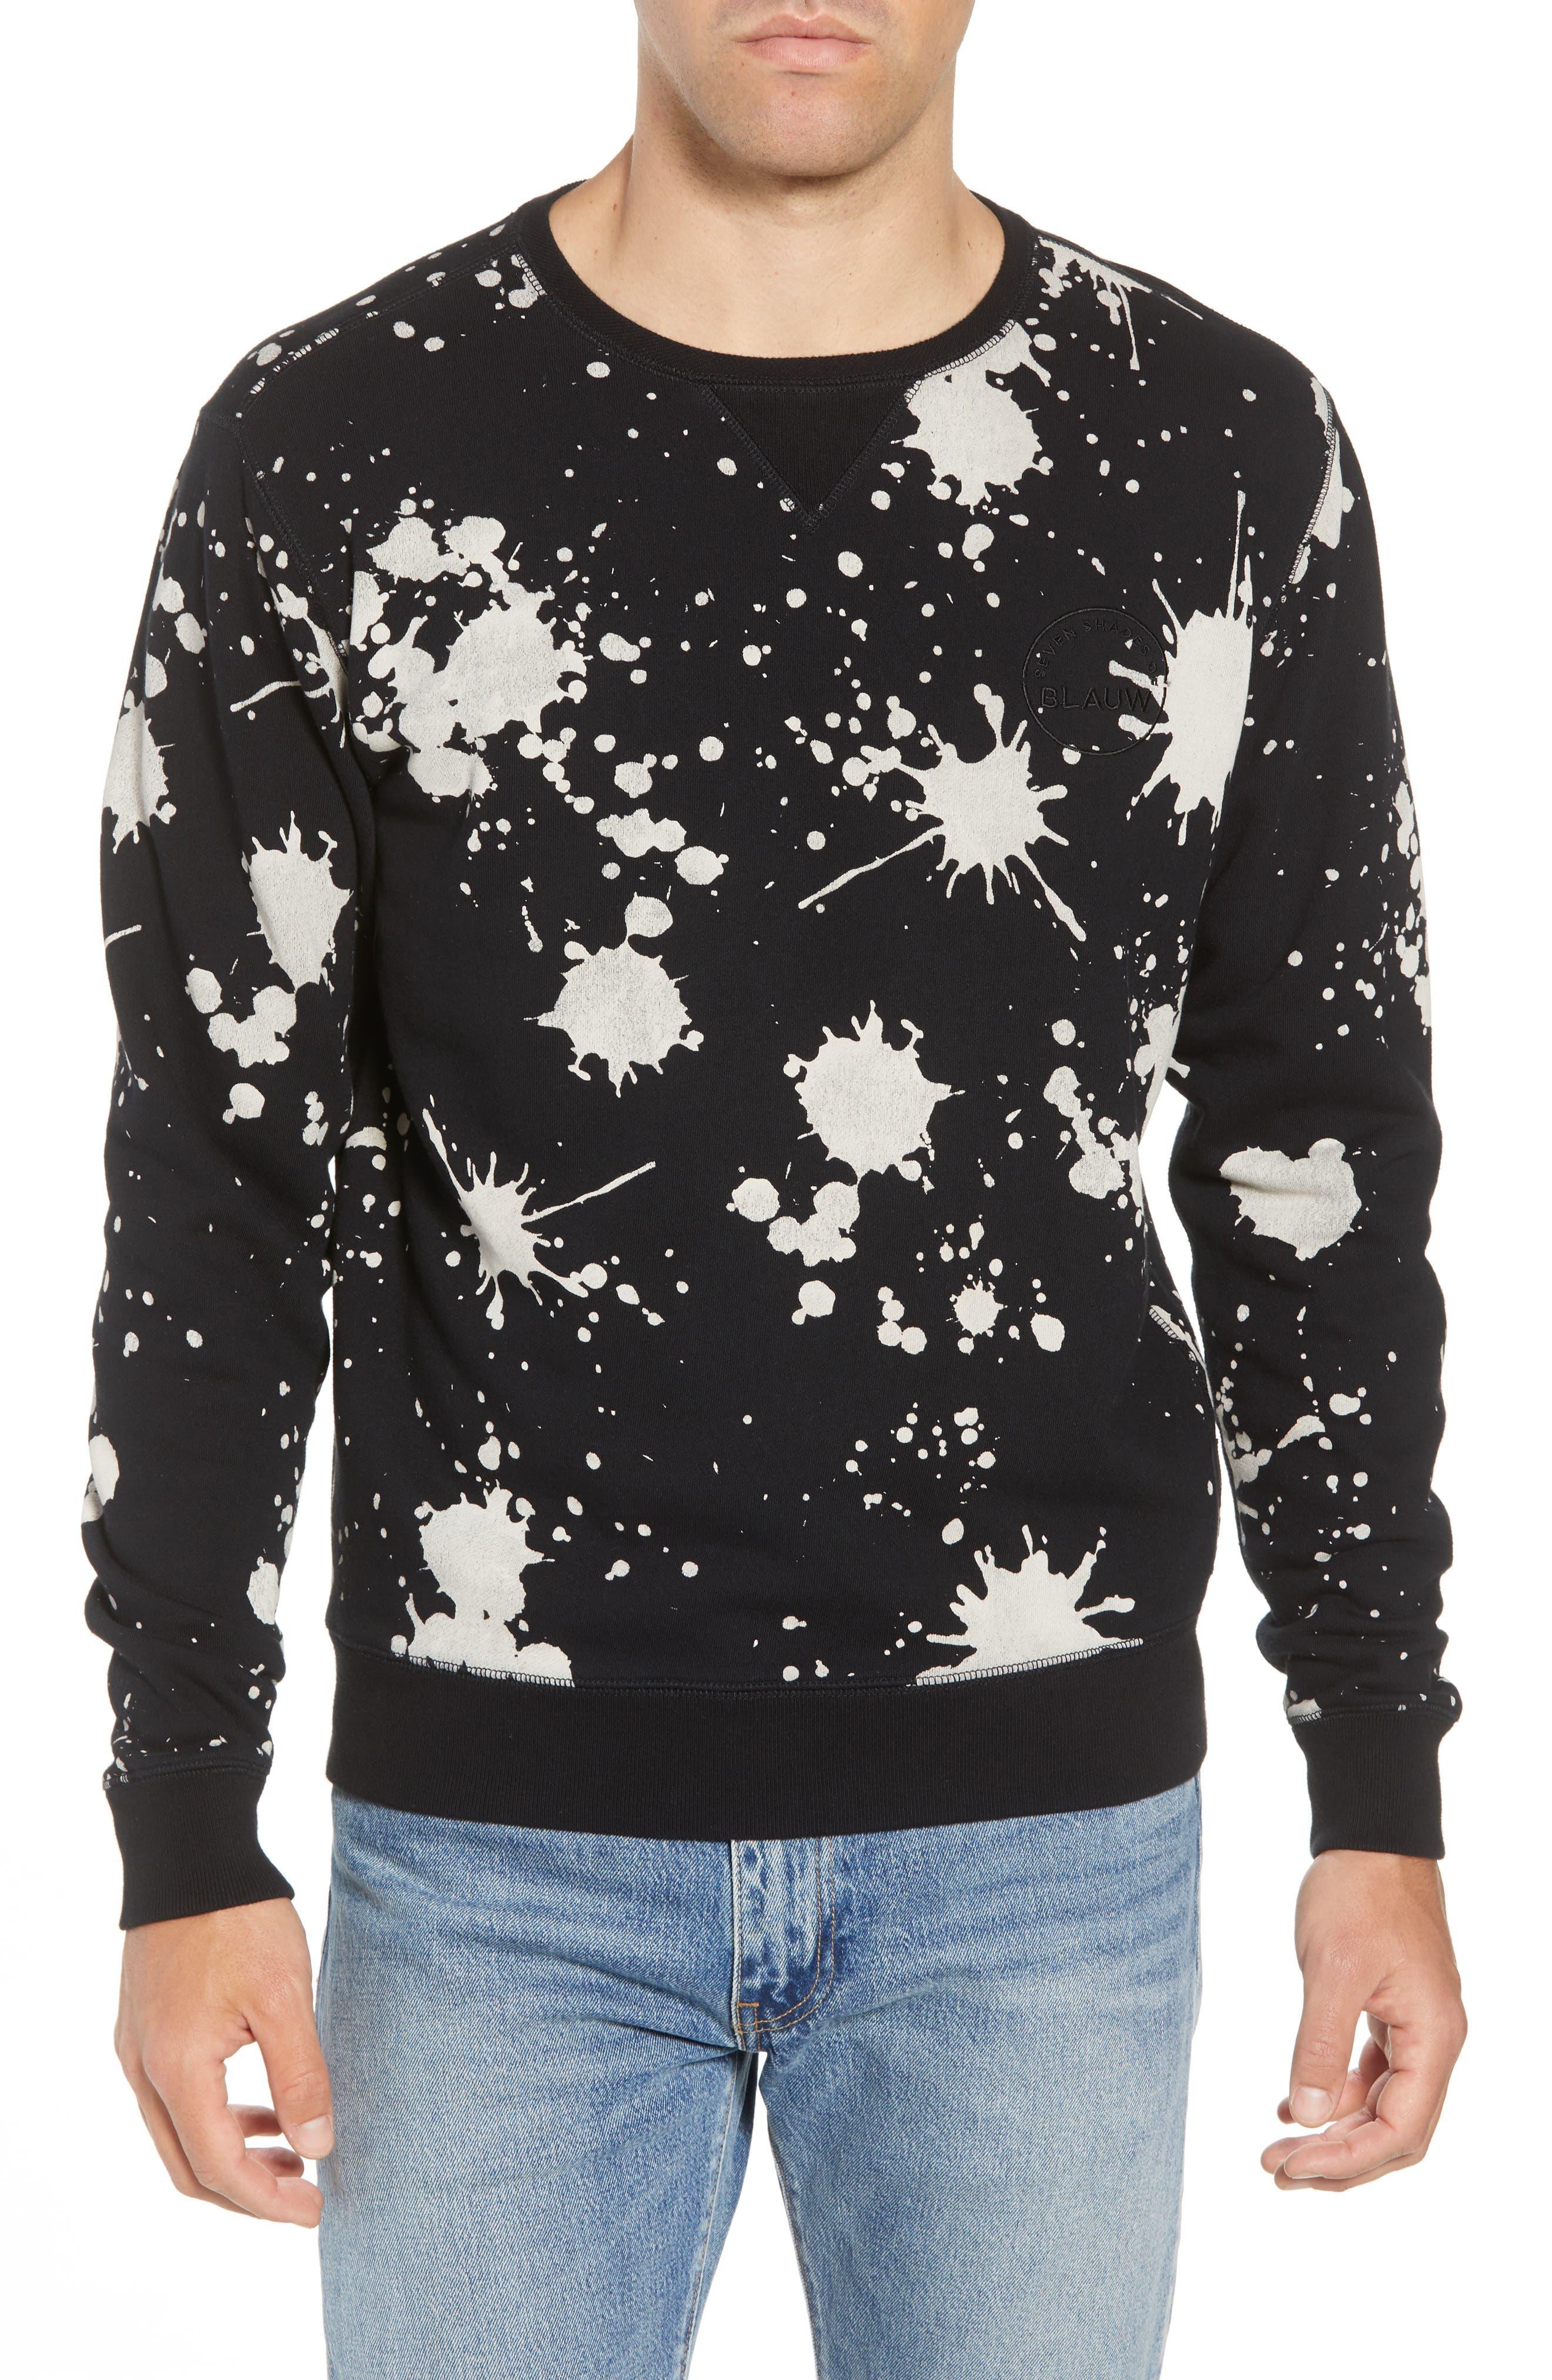 Amsterdams Blauw Concept Sweatshirt,                         Main,                         color, COMBO A